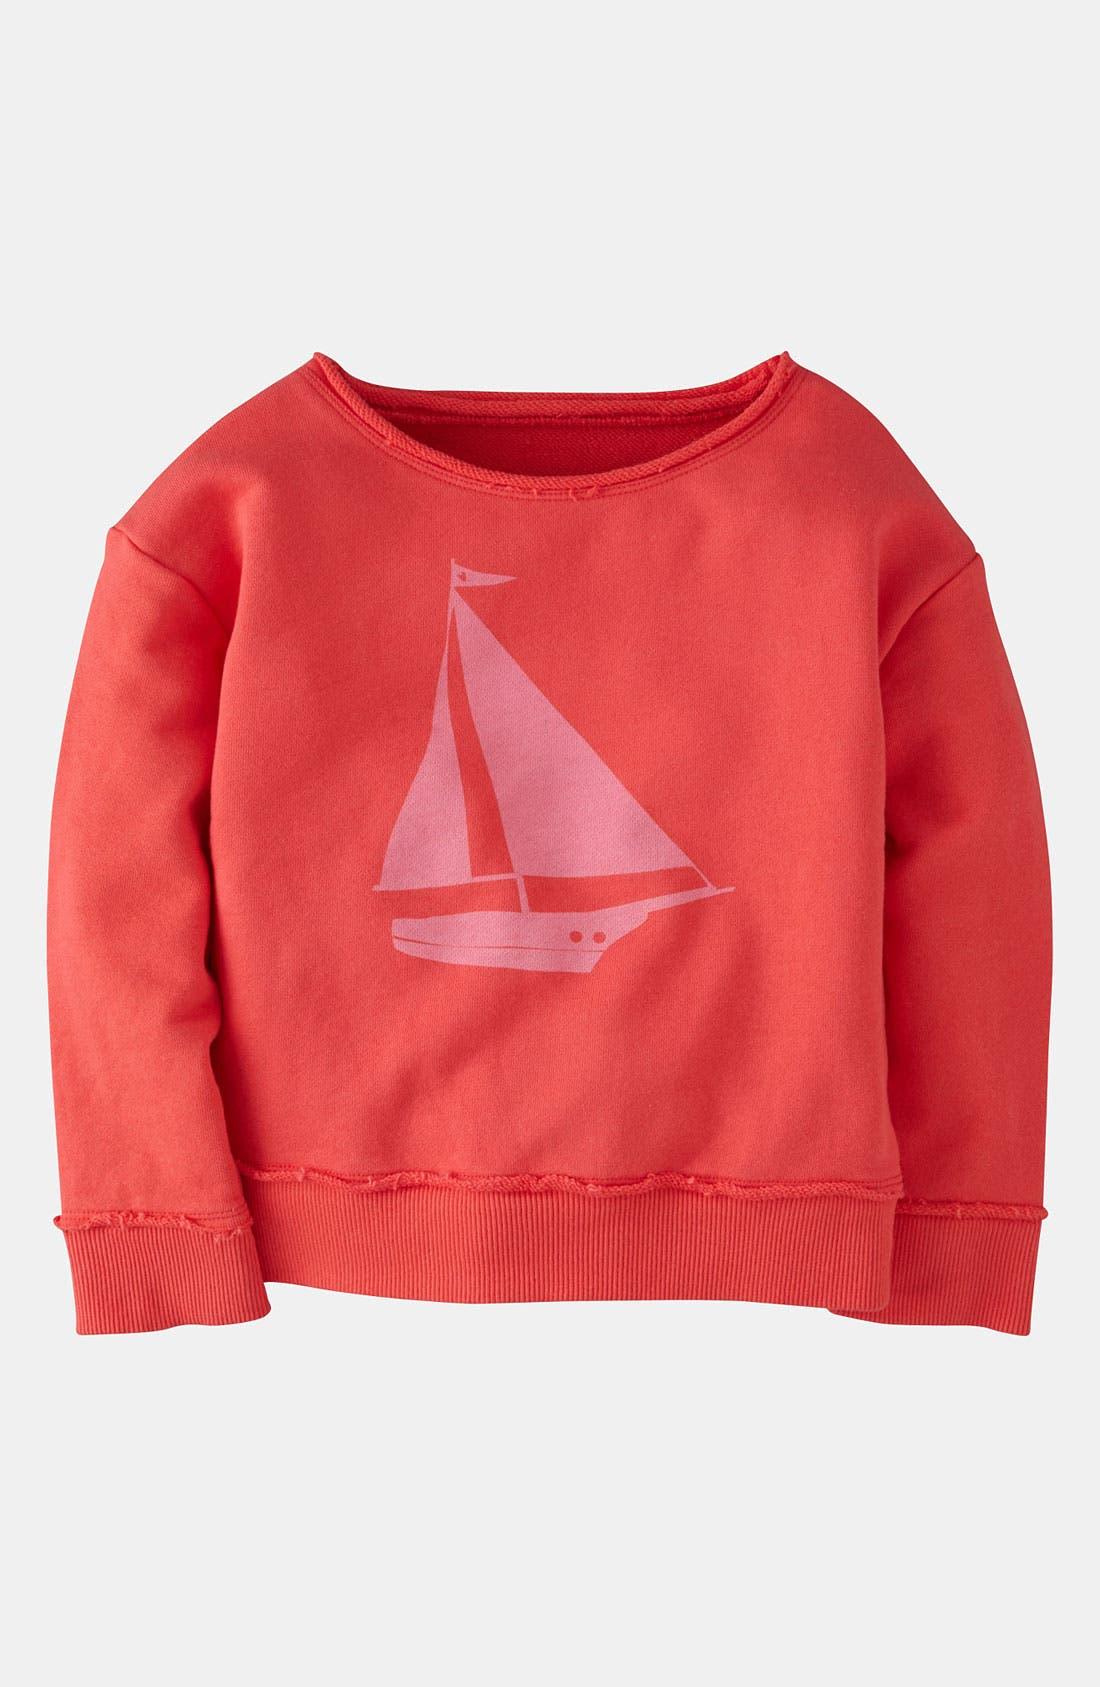 Main Image - Mini Boden 'Washed Logo' Sweatshirt (Little Girls & Big Girls)